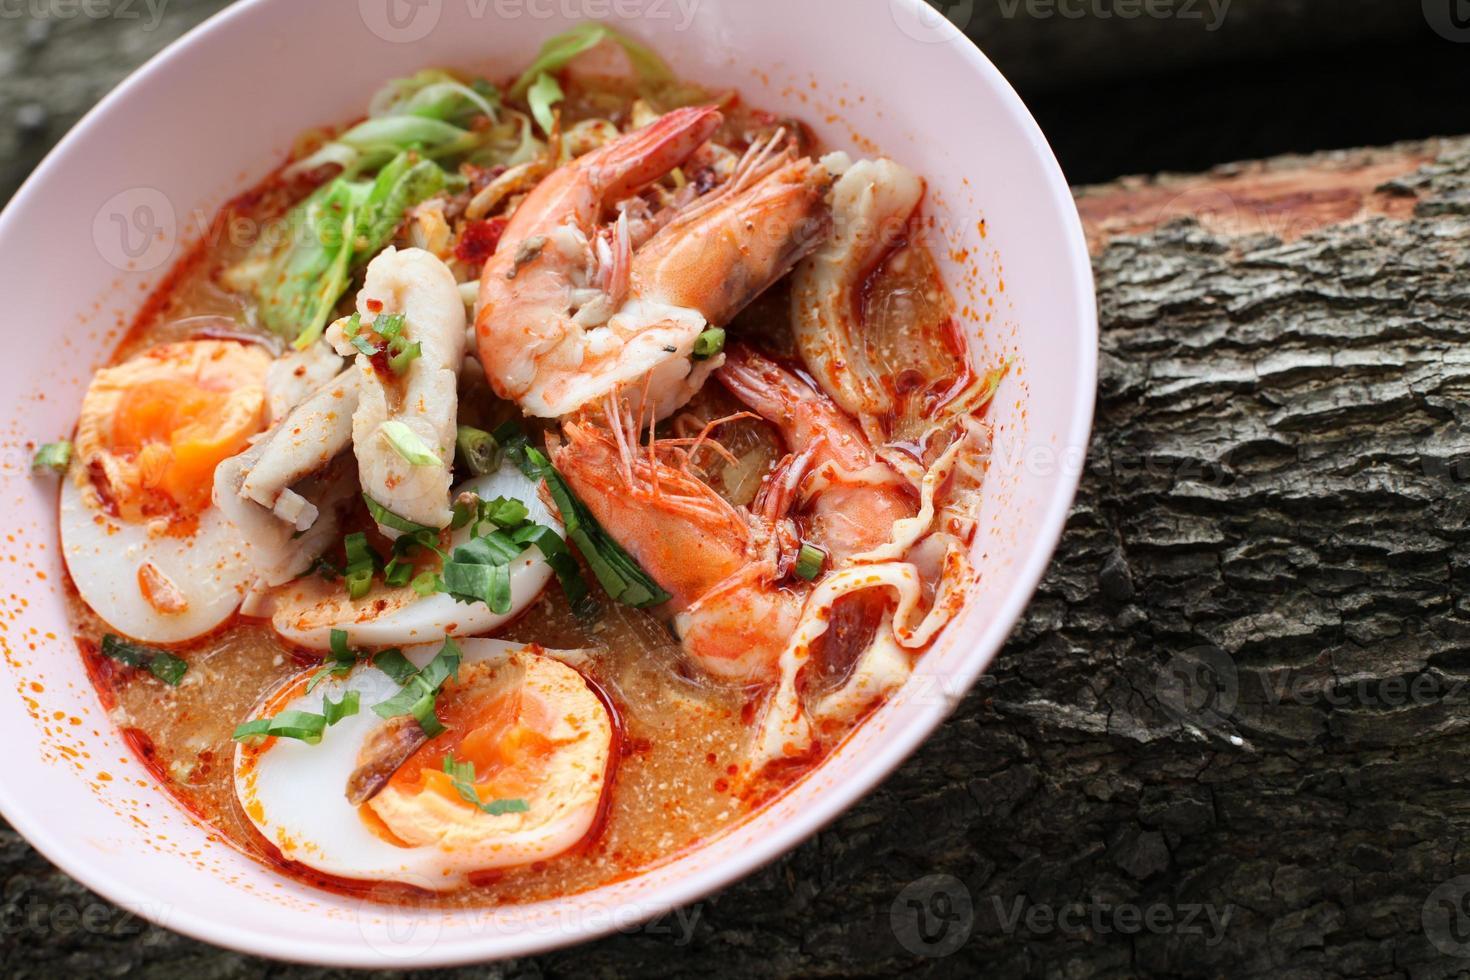 Tom yum Kung Thai Food spice and yummy photo